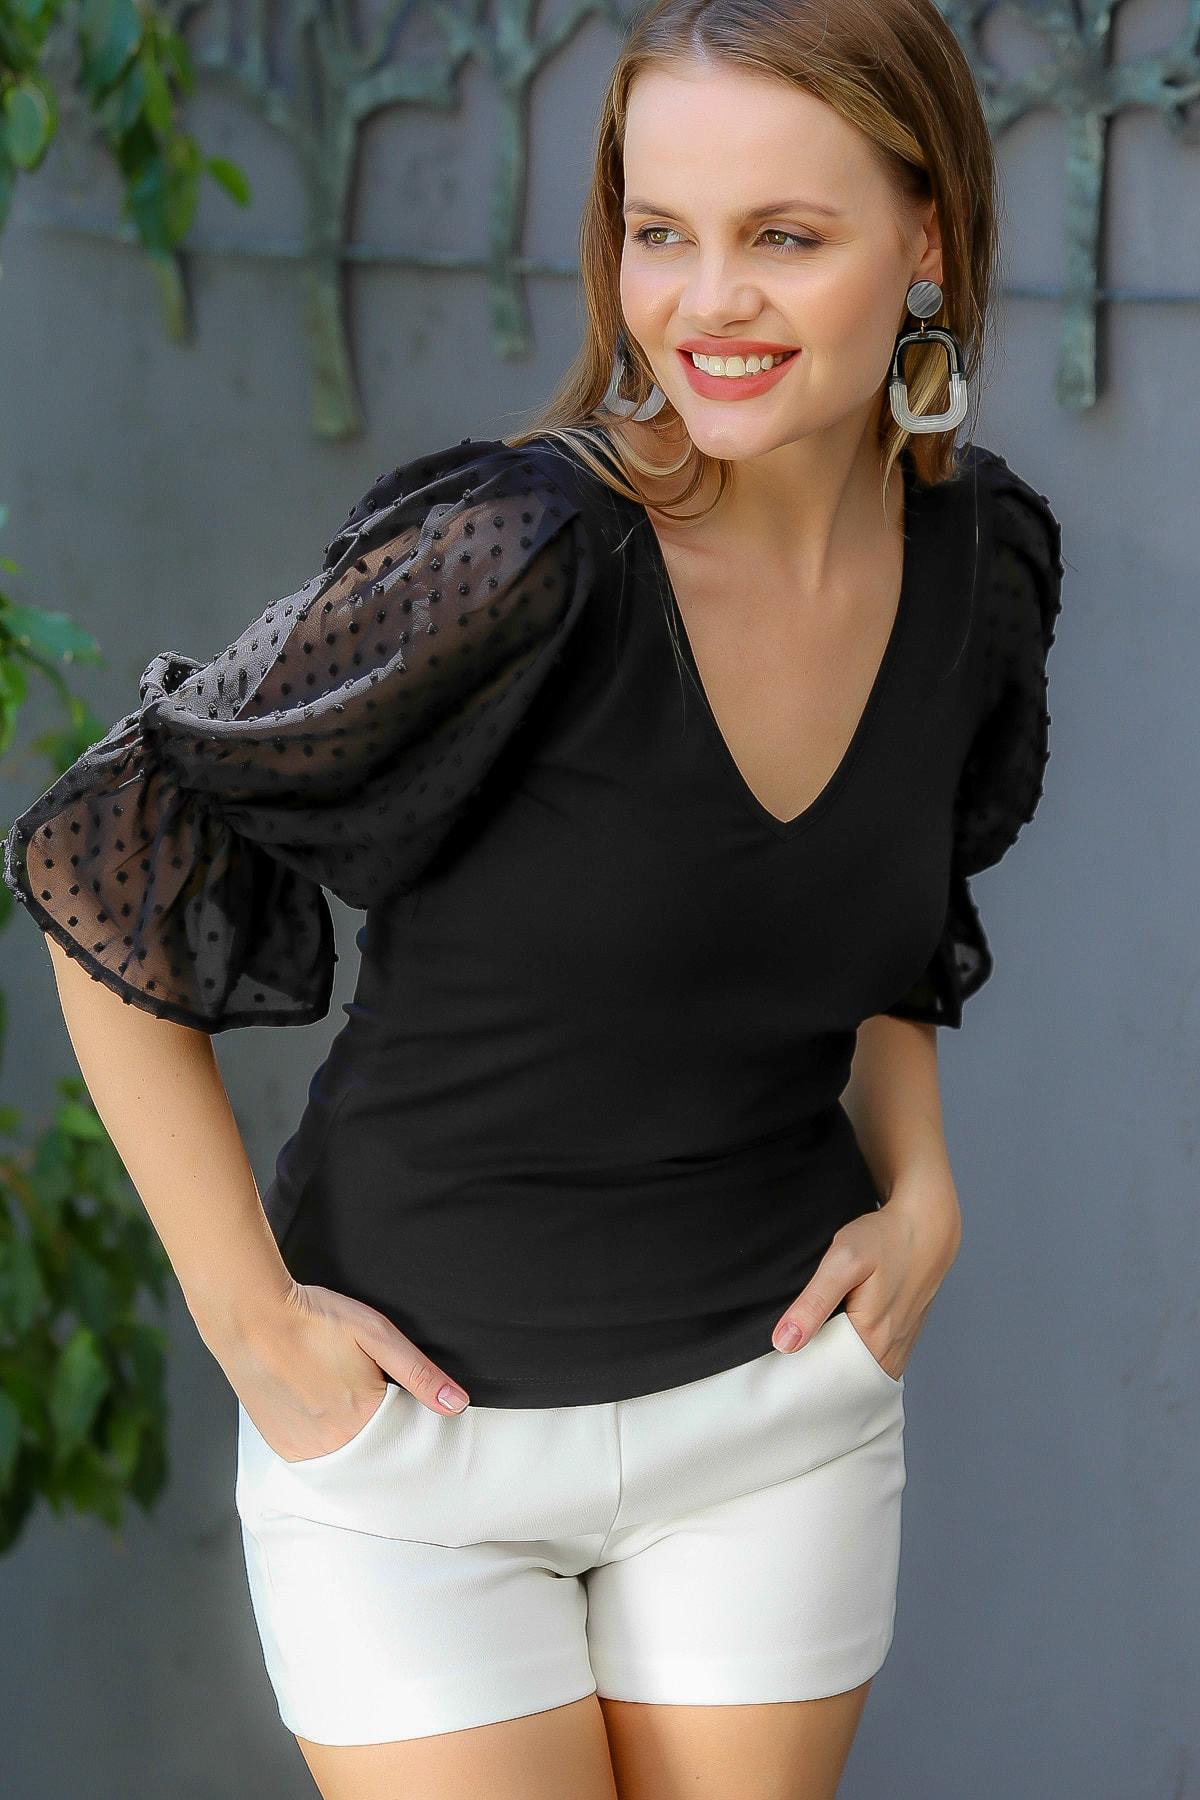 Chiccy Kadın Siyah V Yaka Kapuz Kendinden Desenli Şifon Kol Detaylı Bluz M10010200BL95067